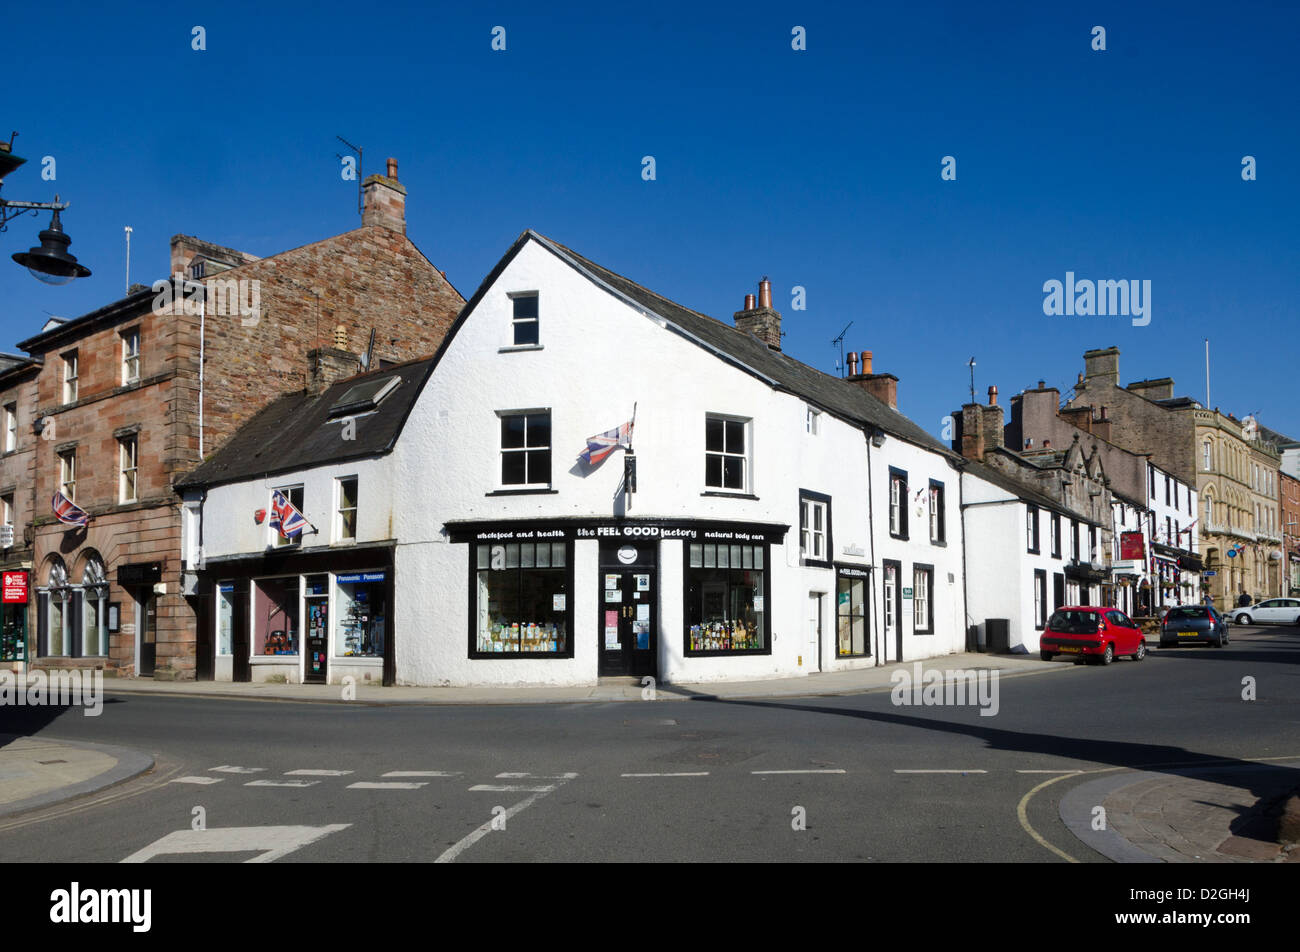 Boroughgate, Appleby-in-Westmorland, Cumbria, England, Britain - Stock Image